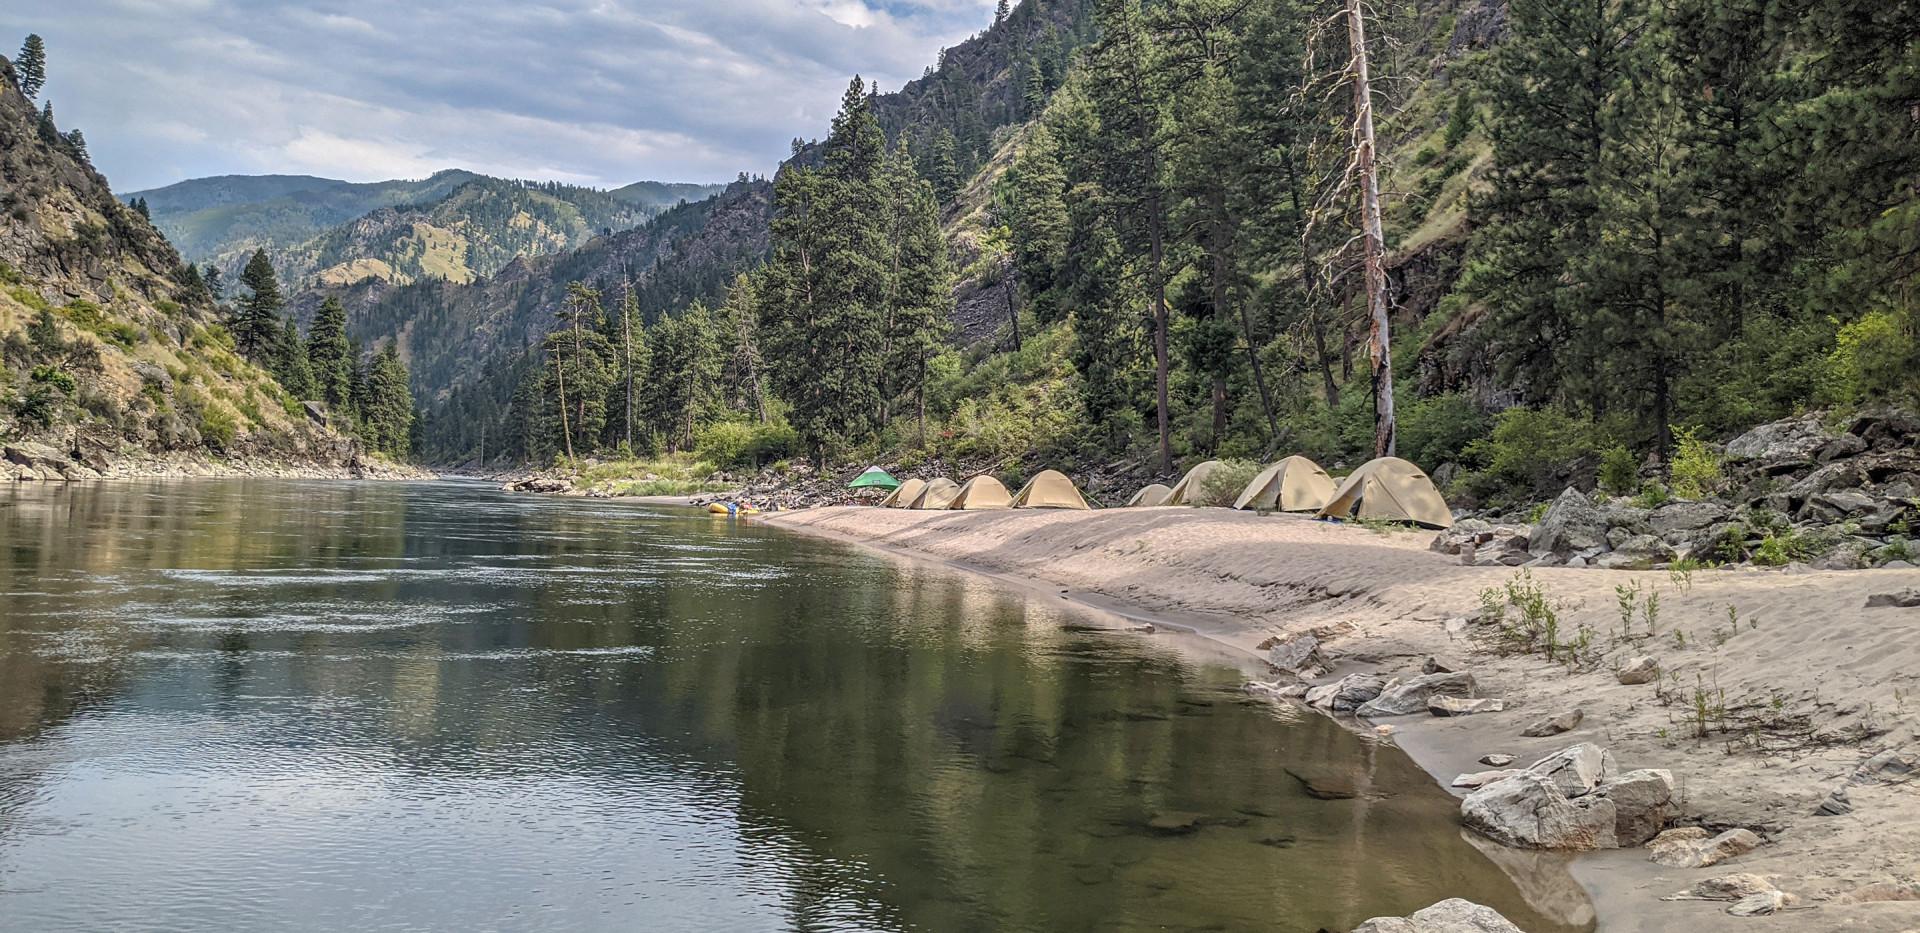 Luxury Camping & Rafting - Safari Style Camp Idaho Salmon